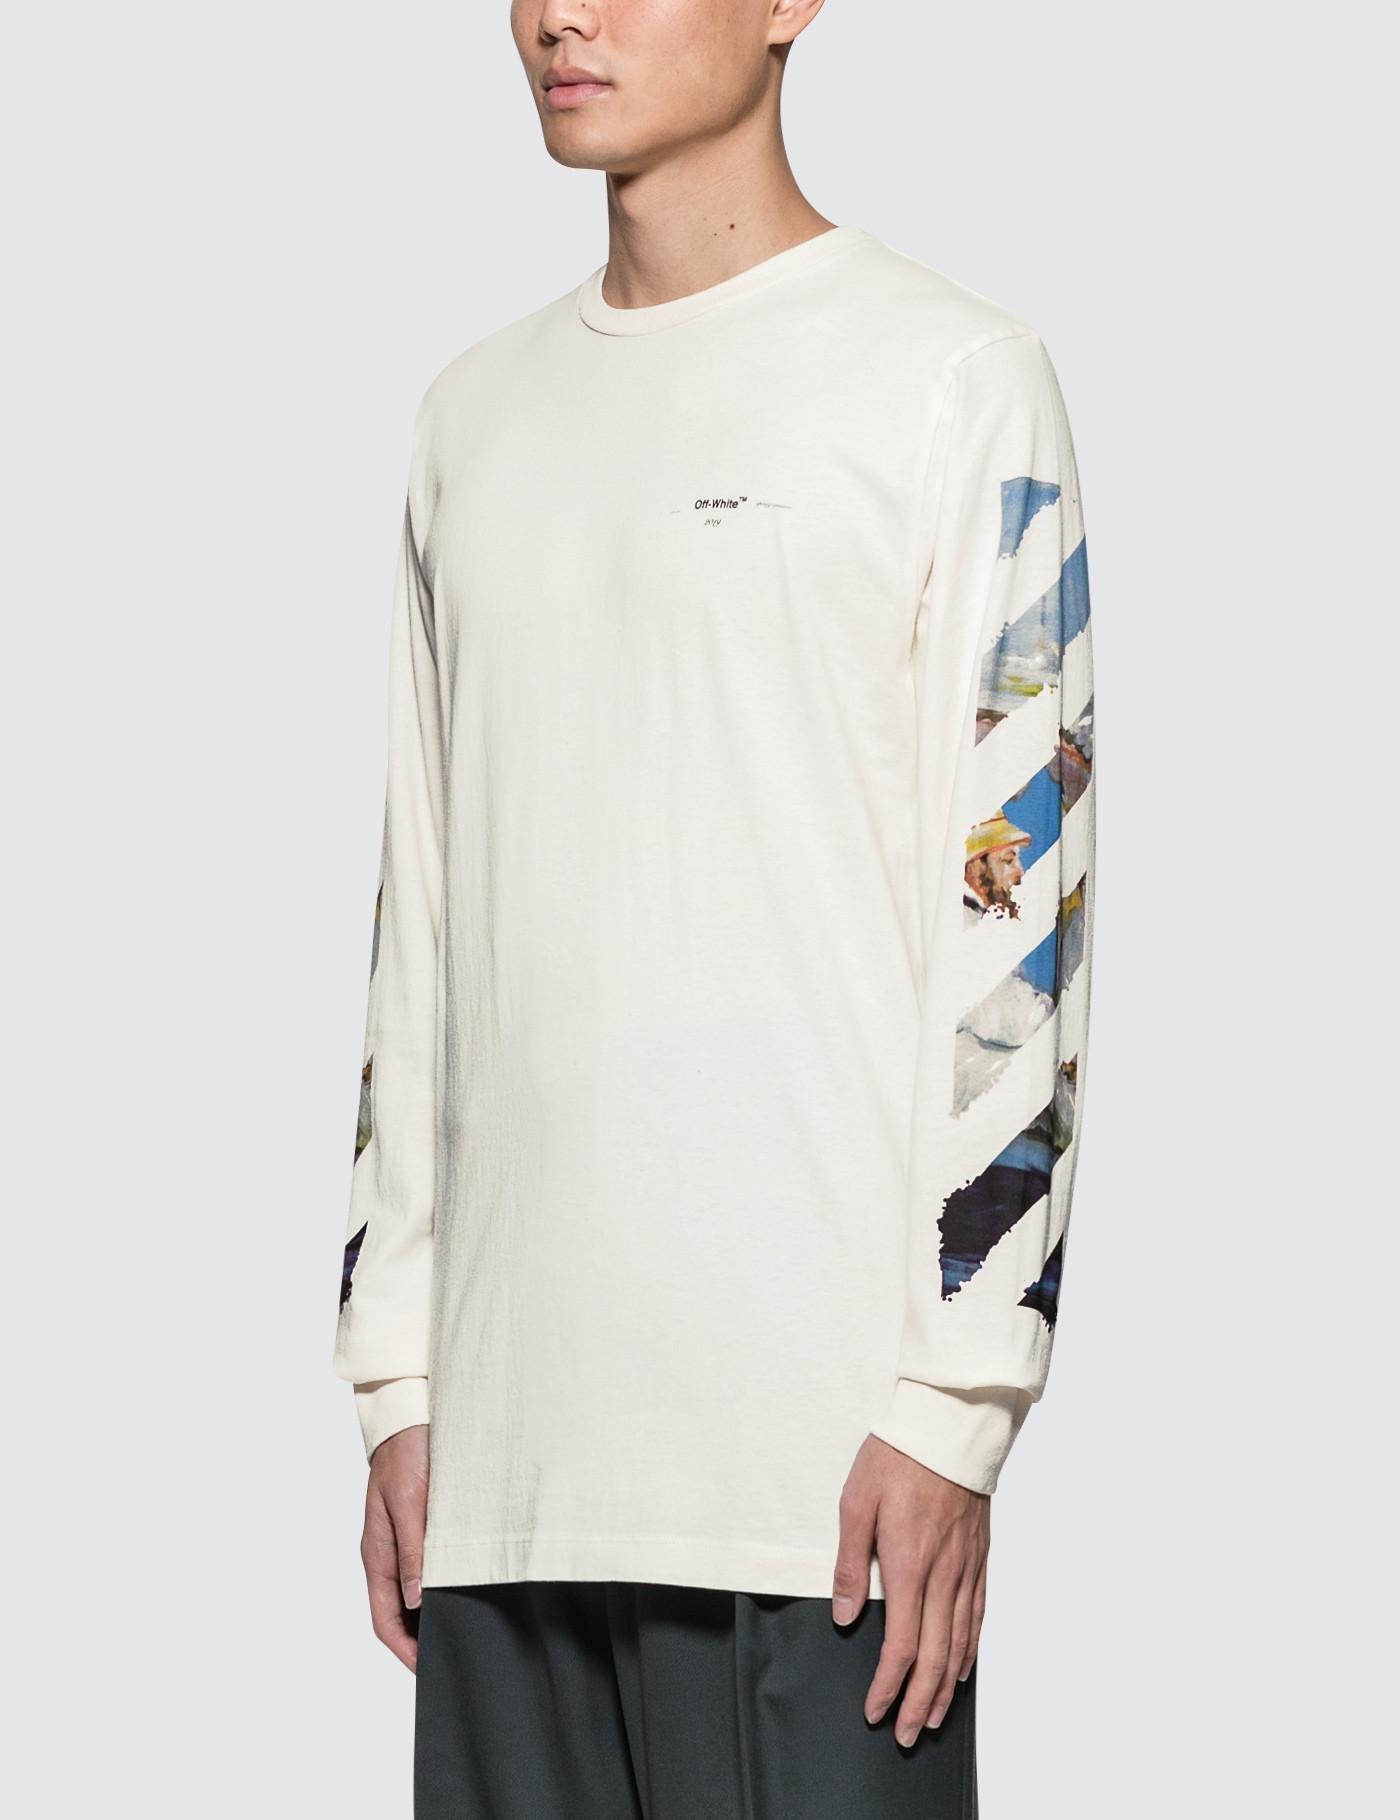 c57dae5452d0 Lyst - Off-White c o Virgil Abloh Diag Colored Arrows L s T-shirt in White  for Men